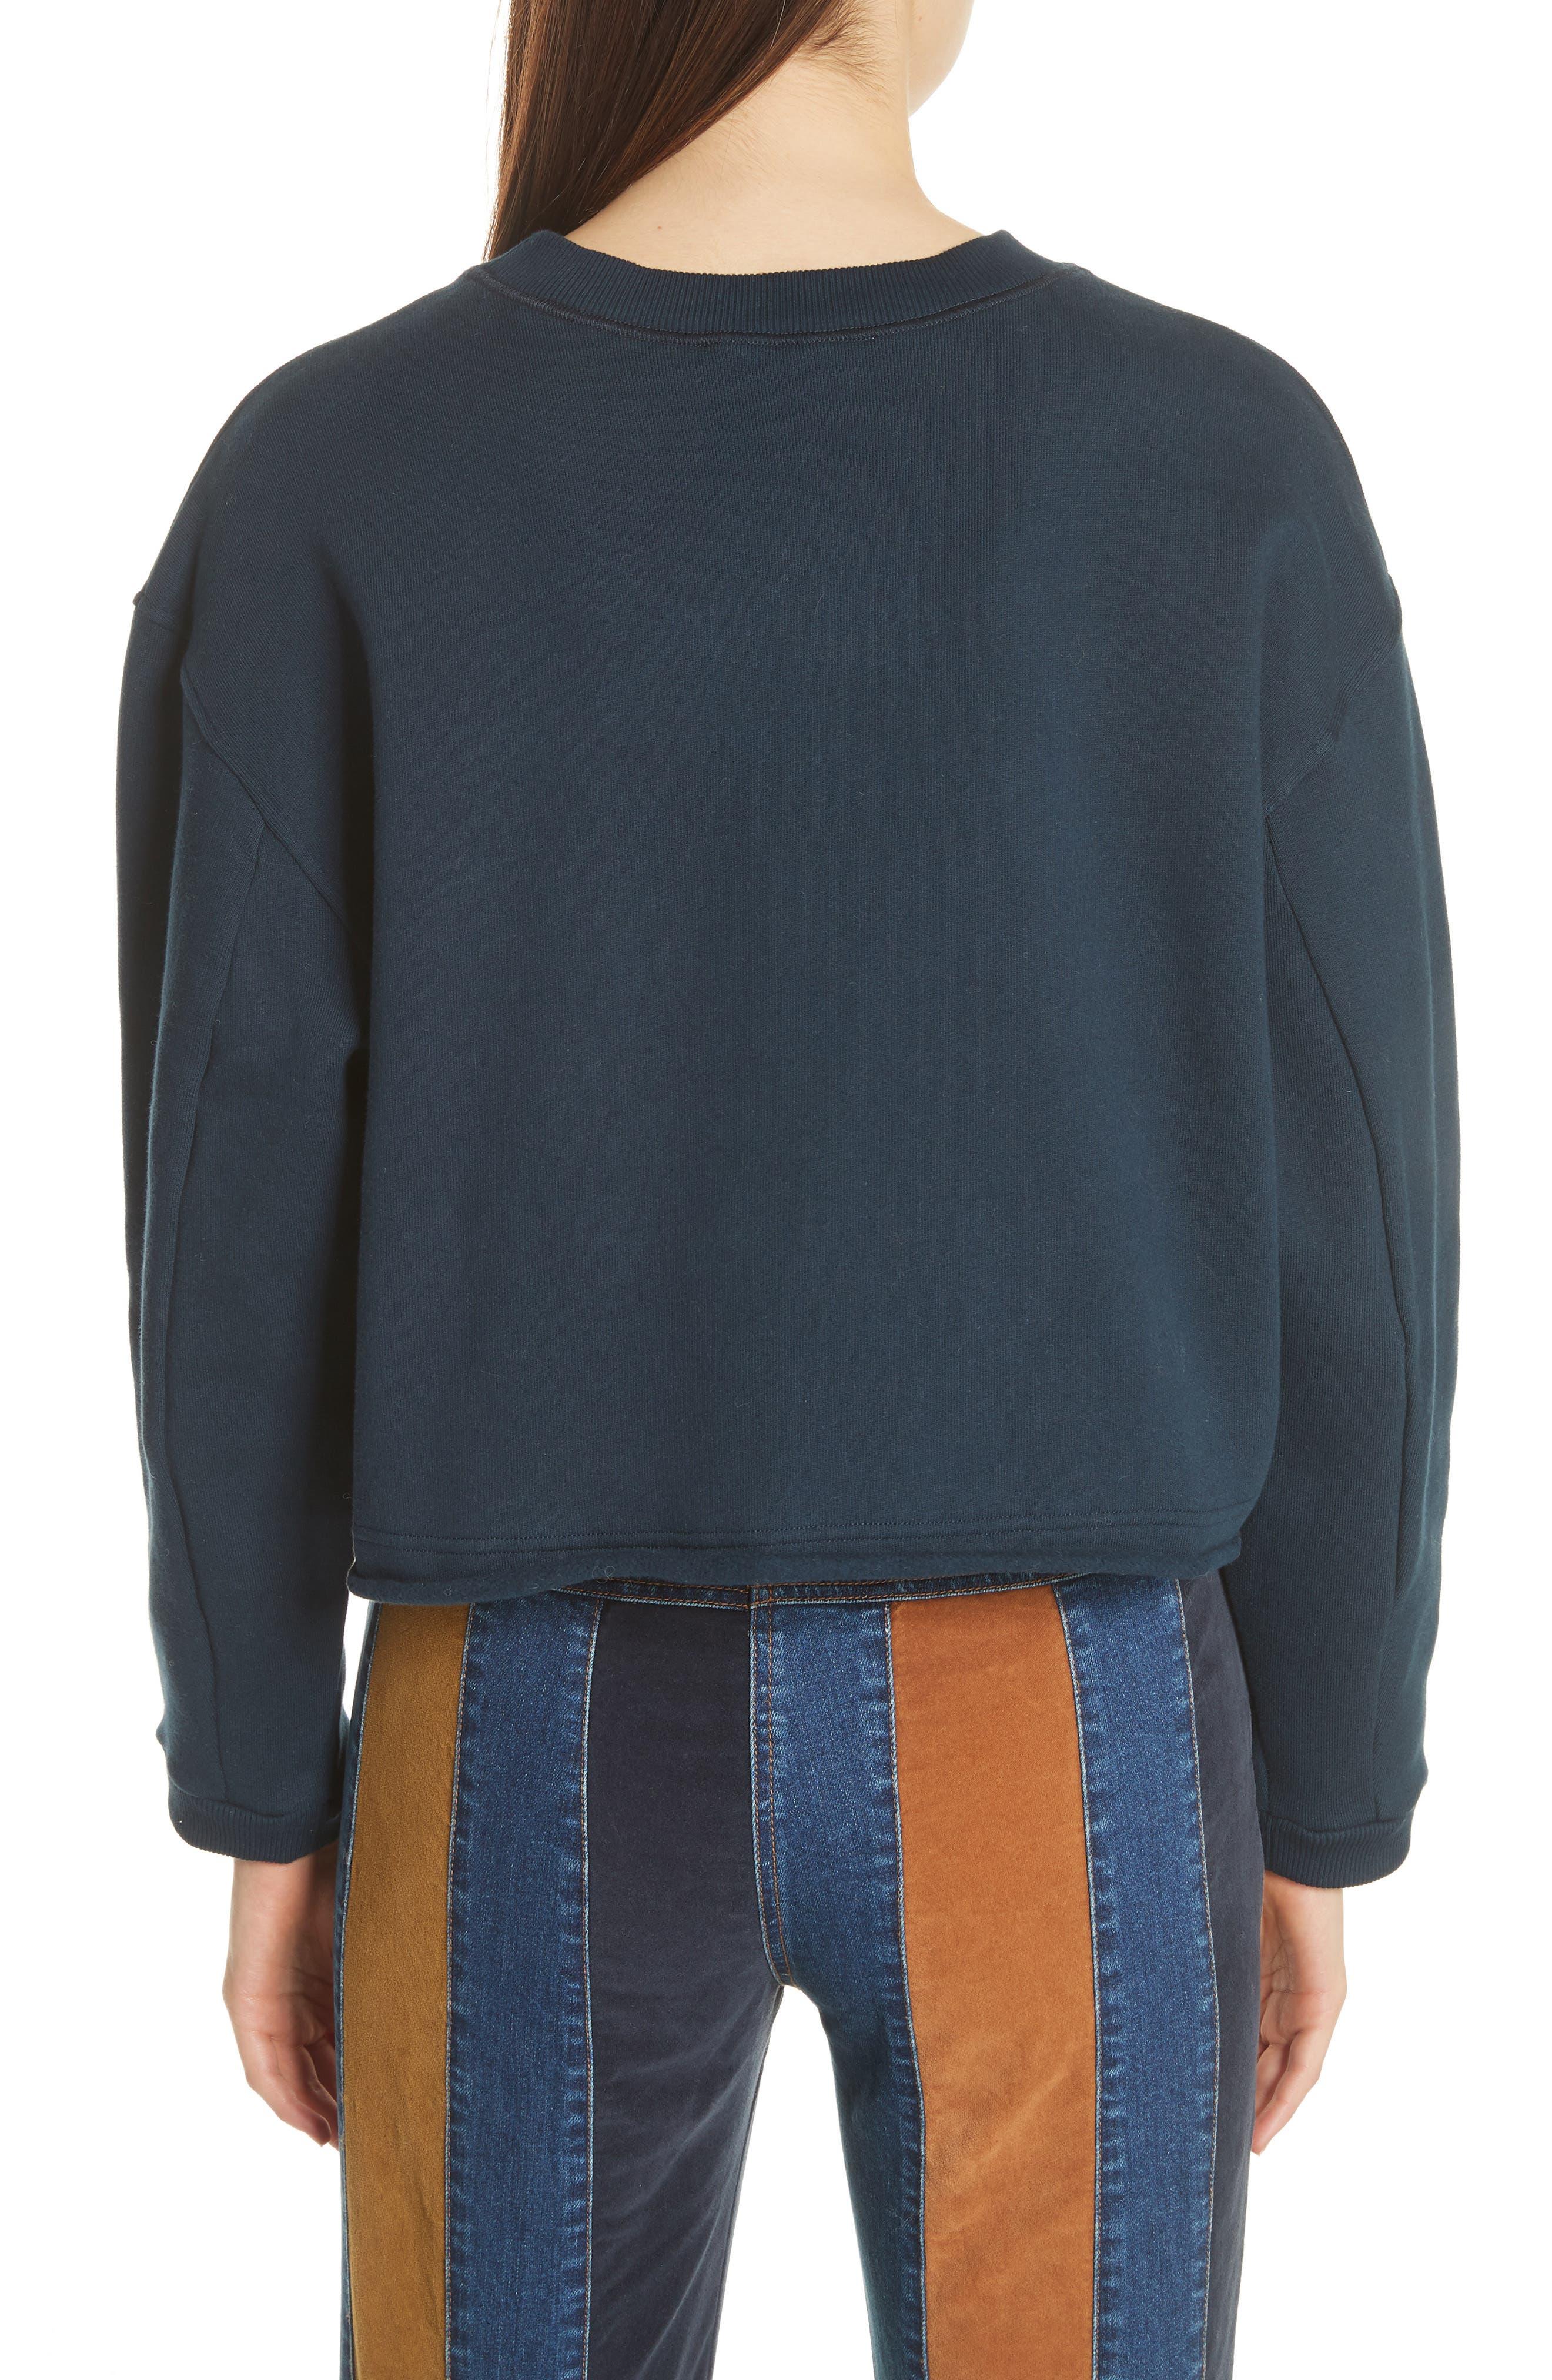 Lip Sweatshirt,                             Alternate thumbnail 2, color,                             930